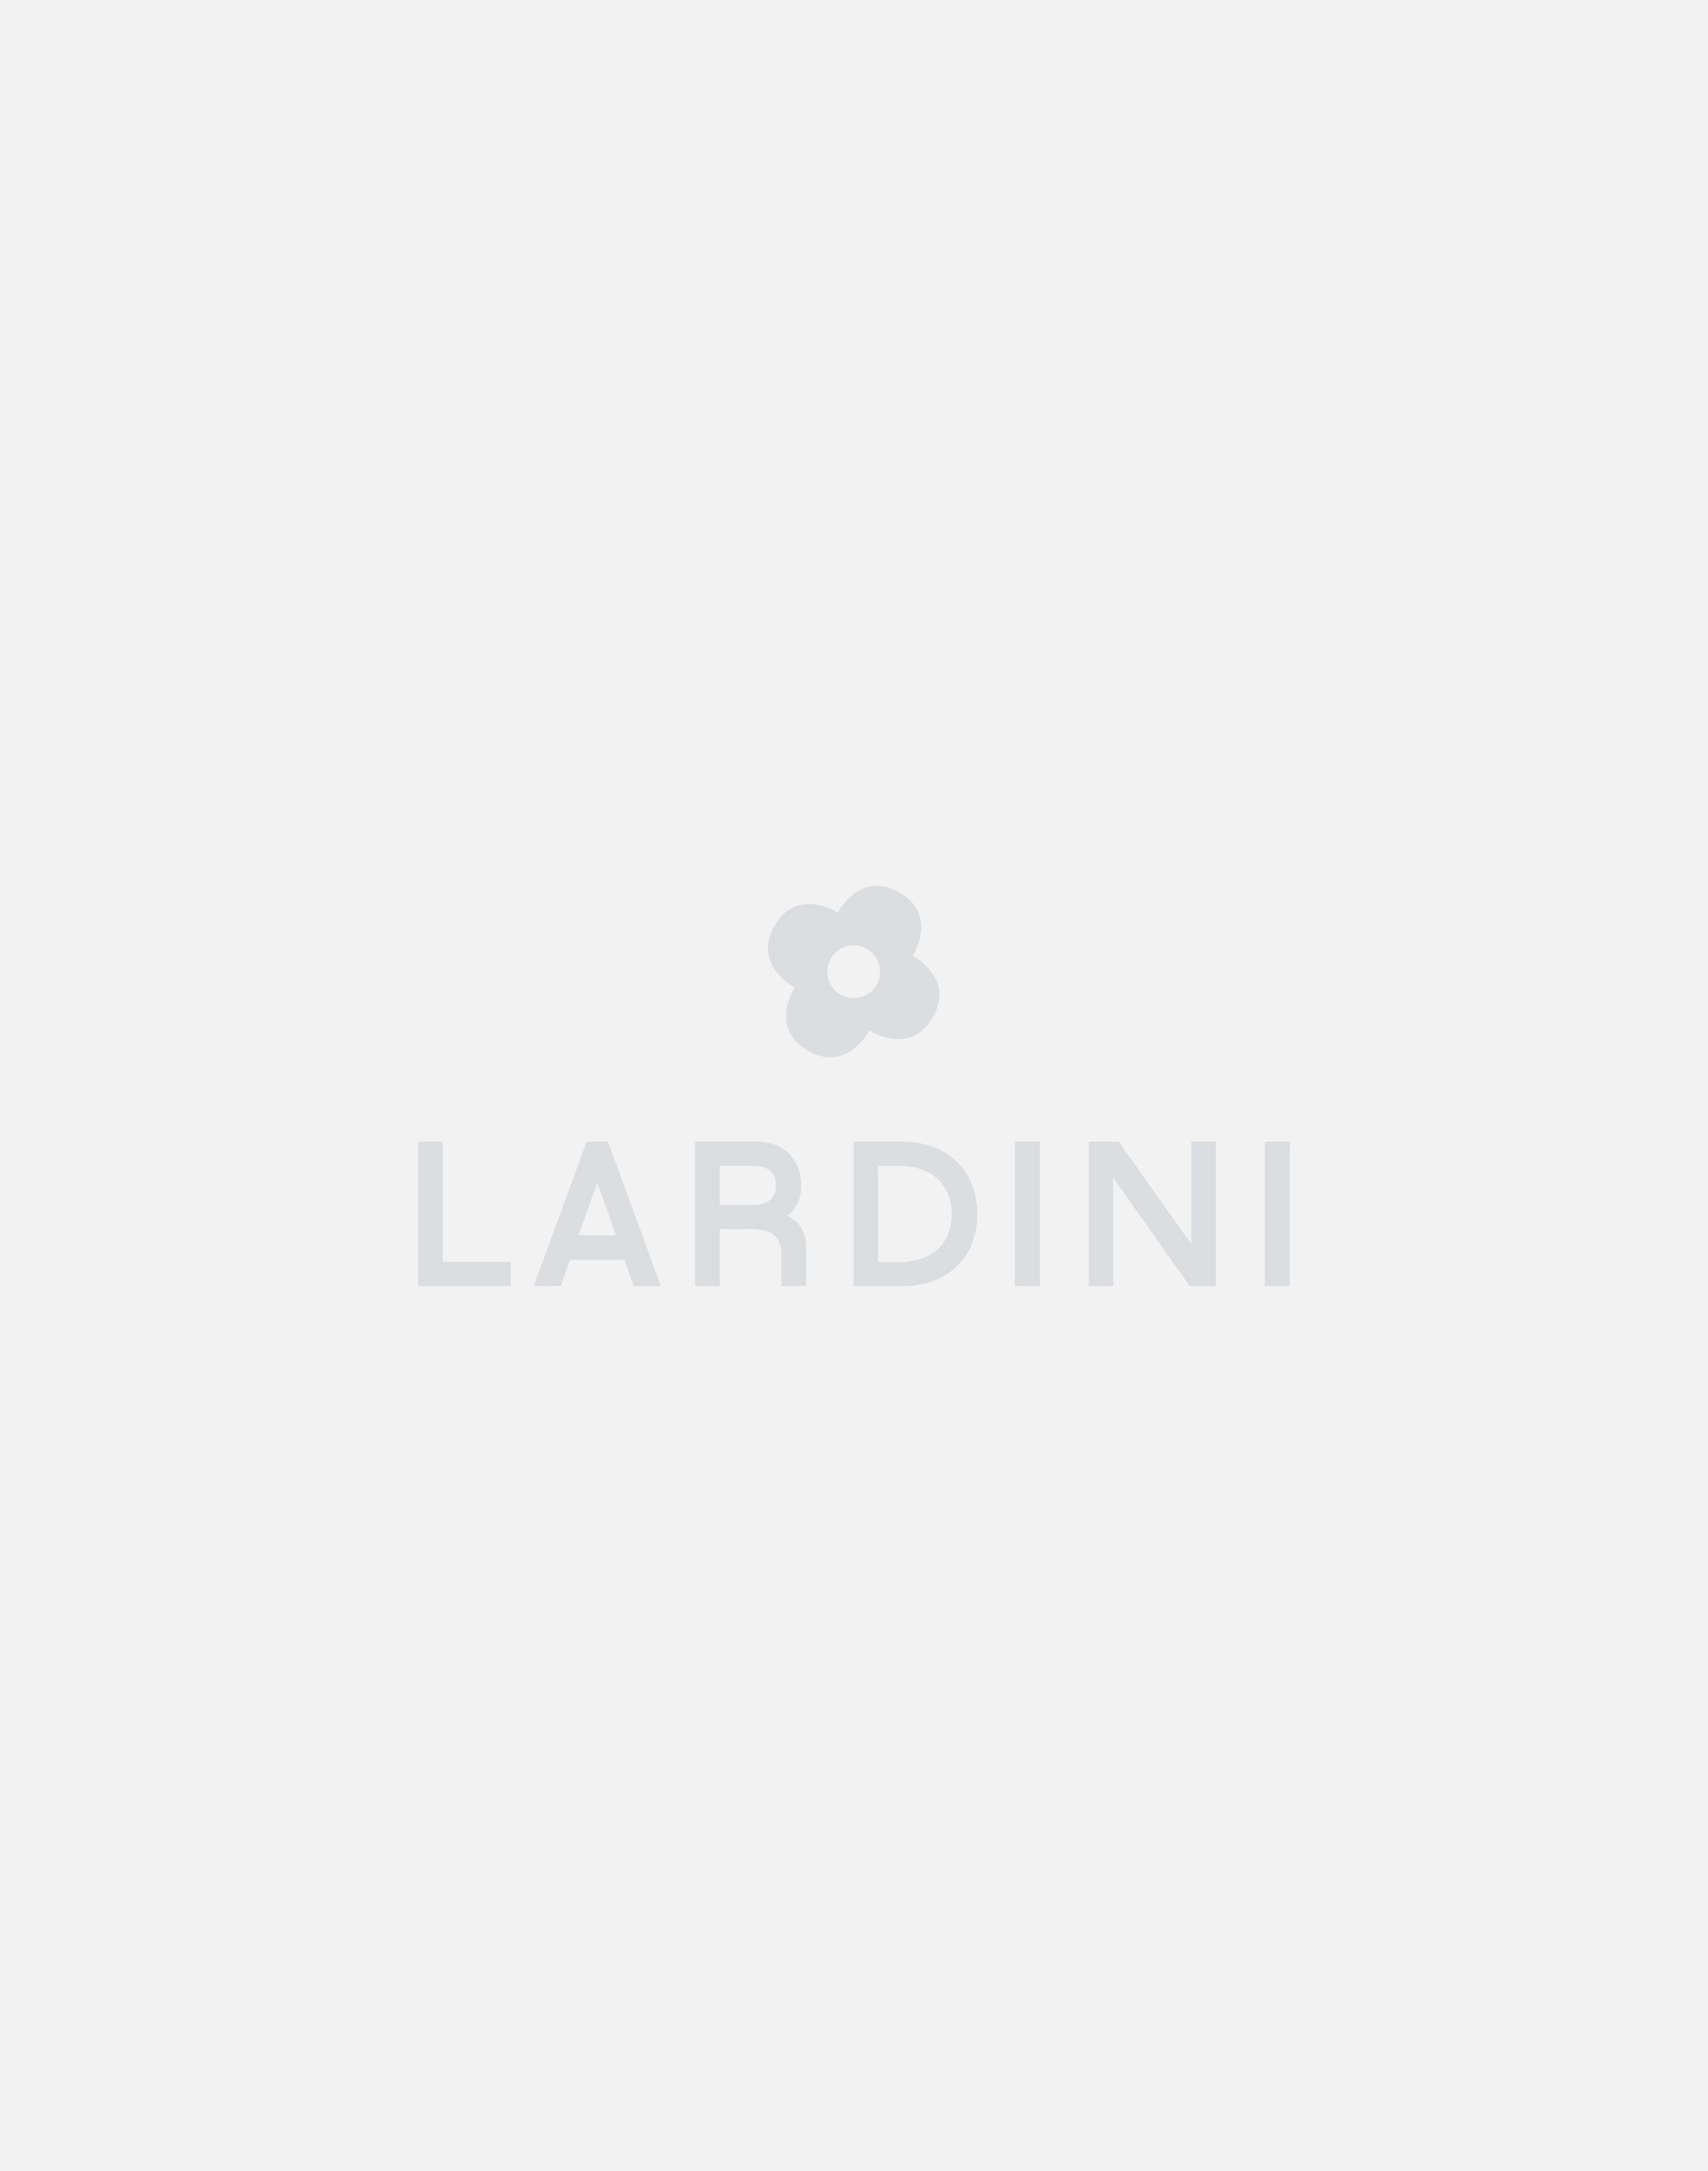 Camicia bianca in cotone a righe blu sottili